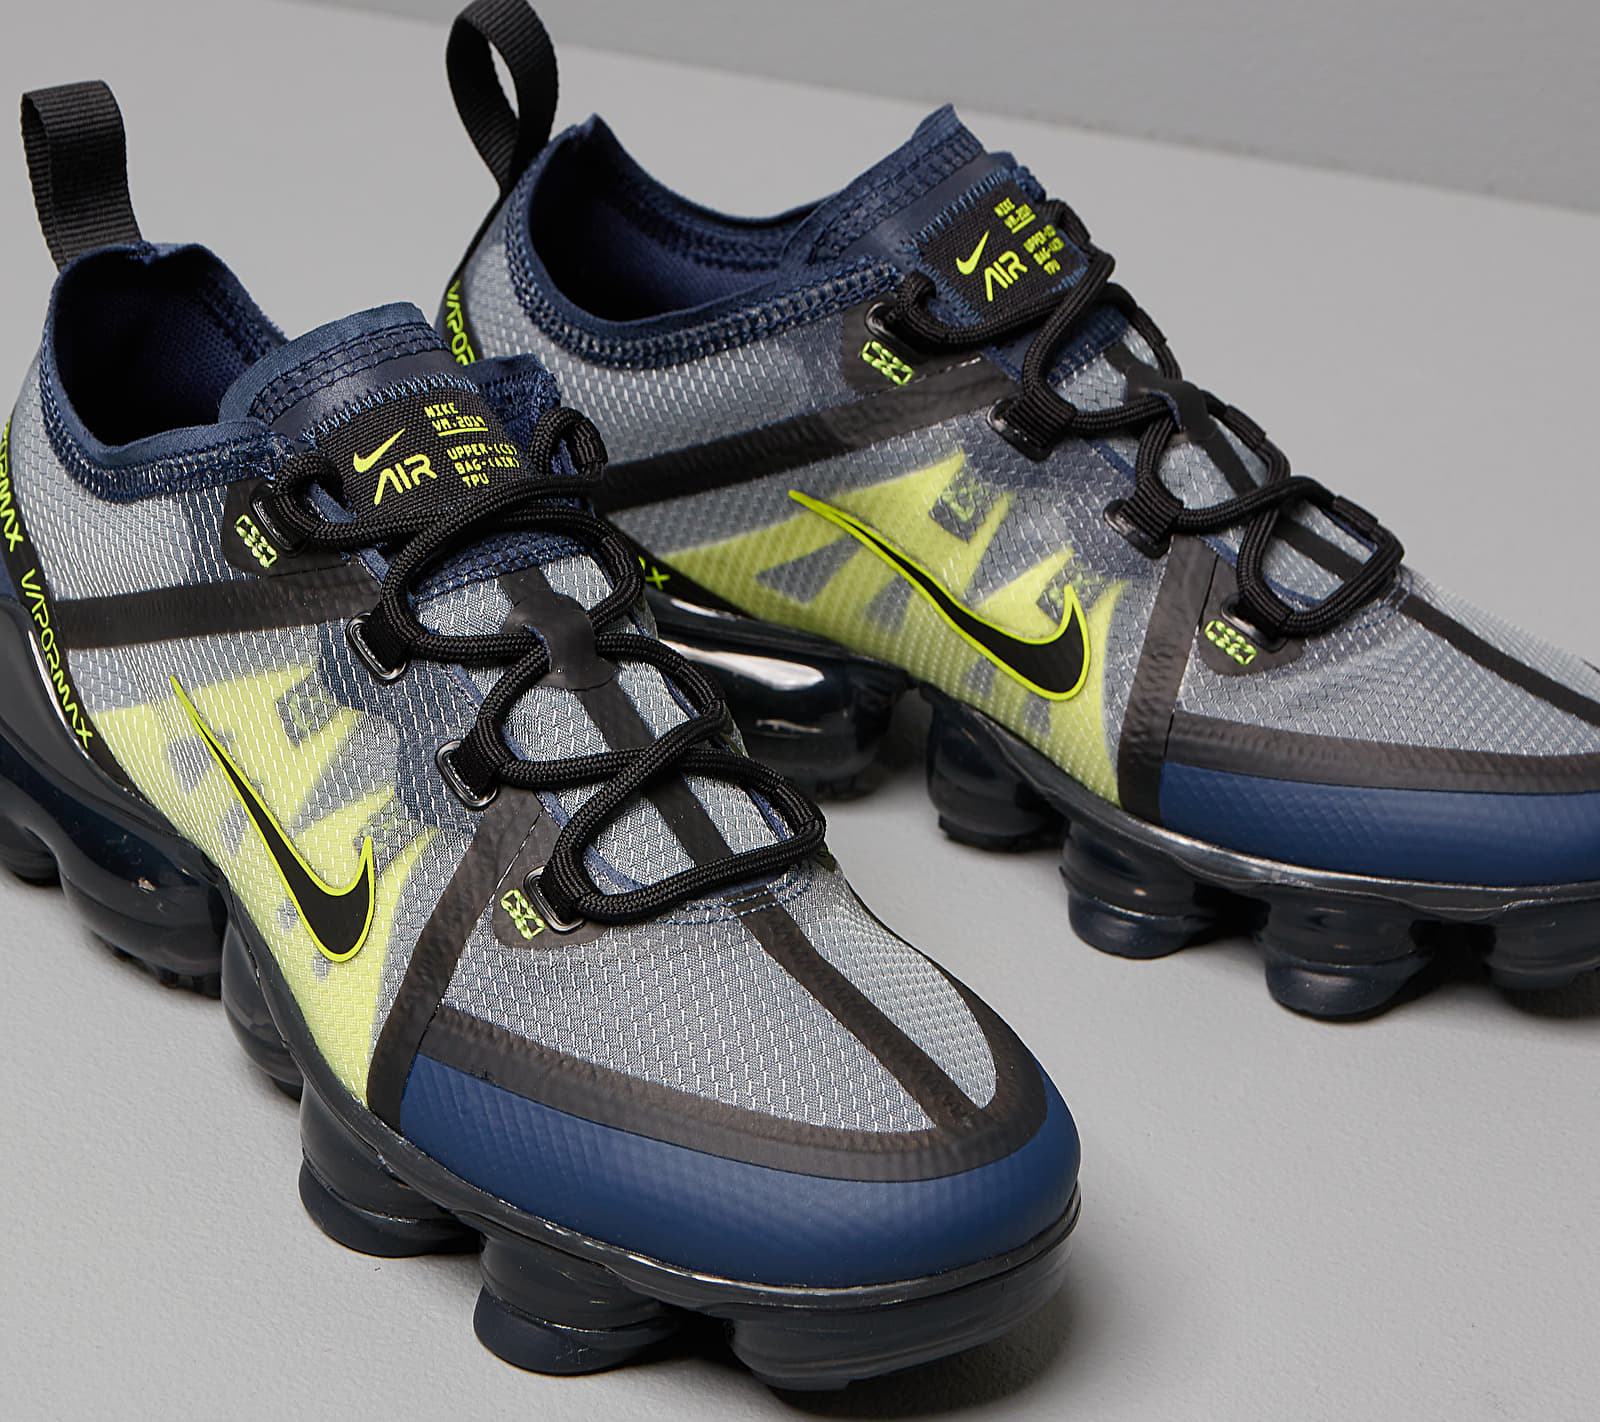 Nike Air Vapormax 2019 (GS) Midnight Navy/ Black-Lemon Venom, Blue